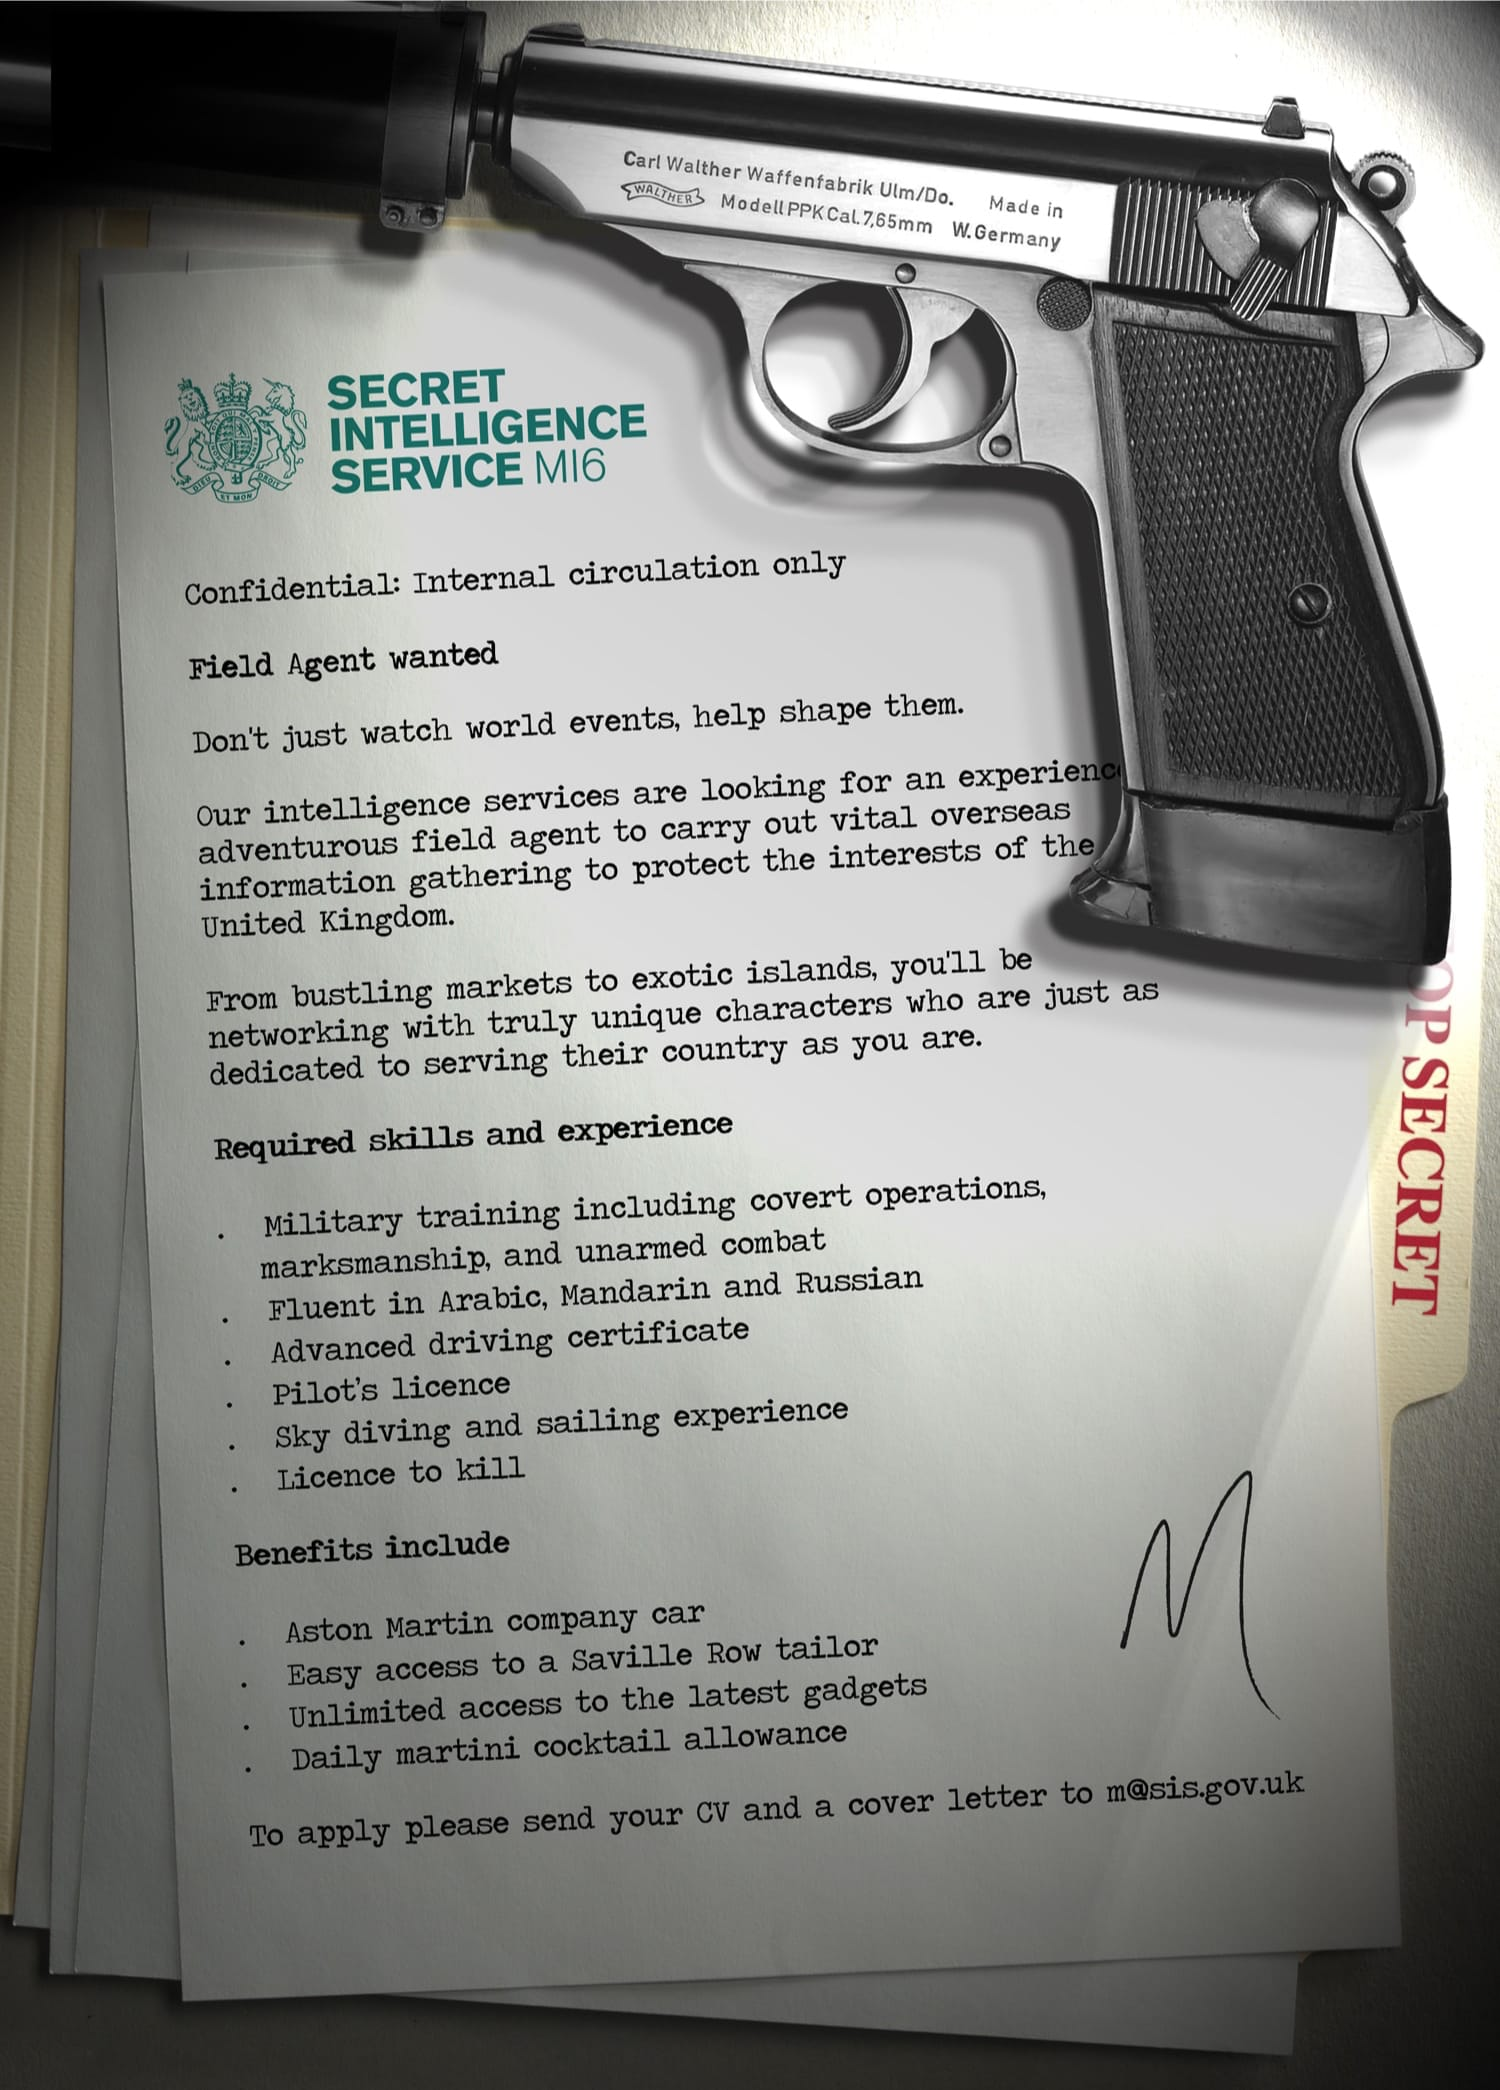 Fictional James Bond recruitment poster - Secret Intelligence Service MI6's internal advertisement for a field agent